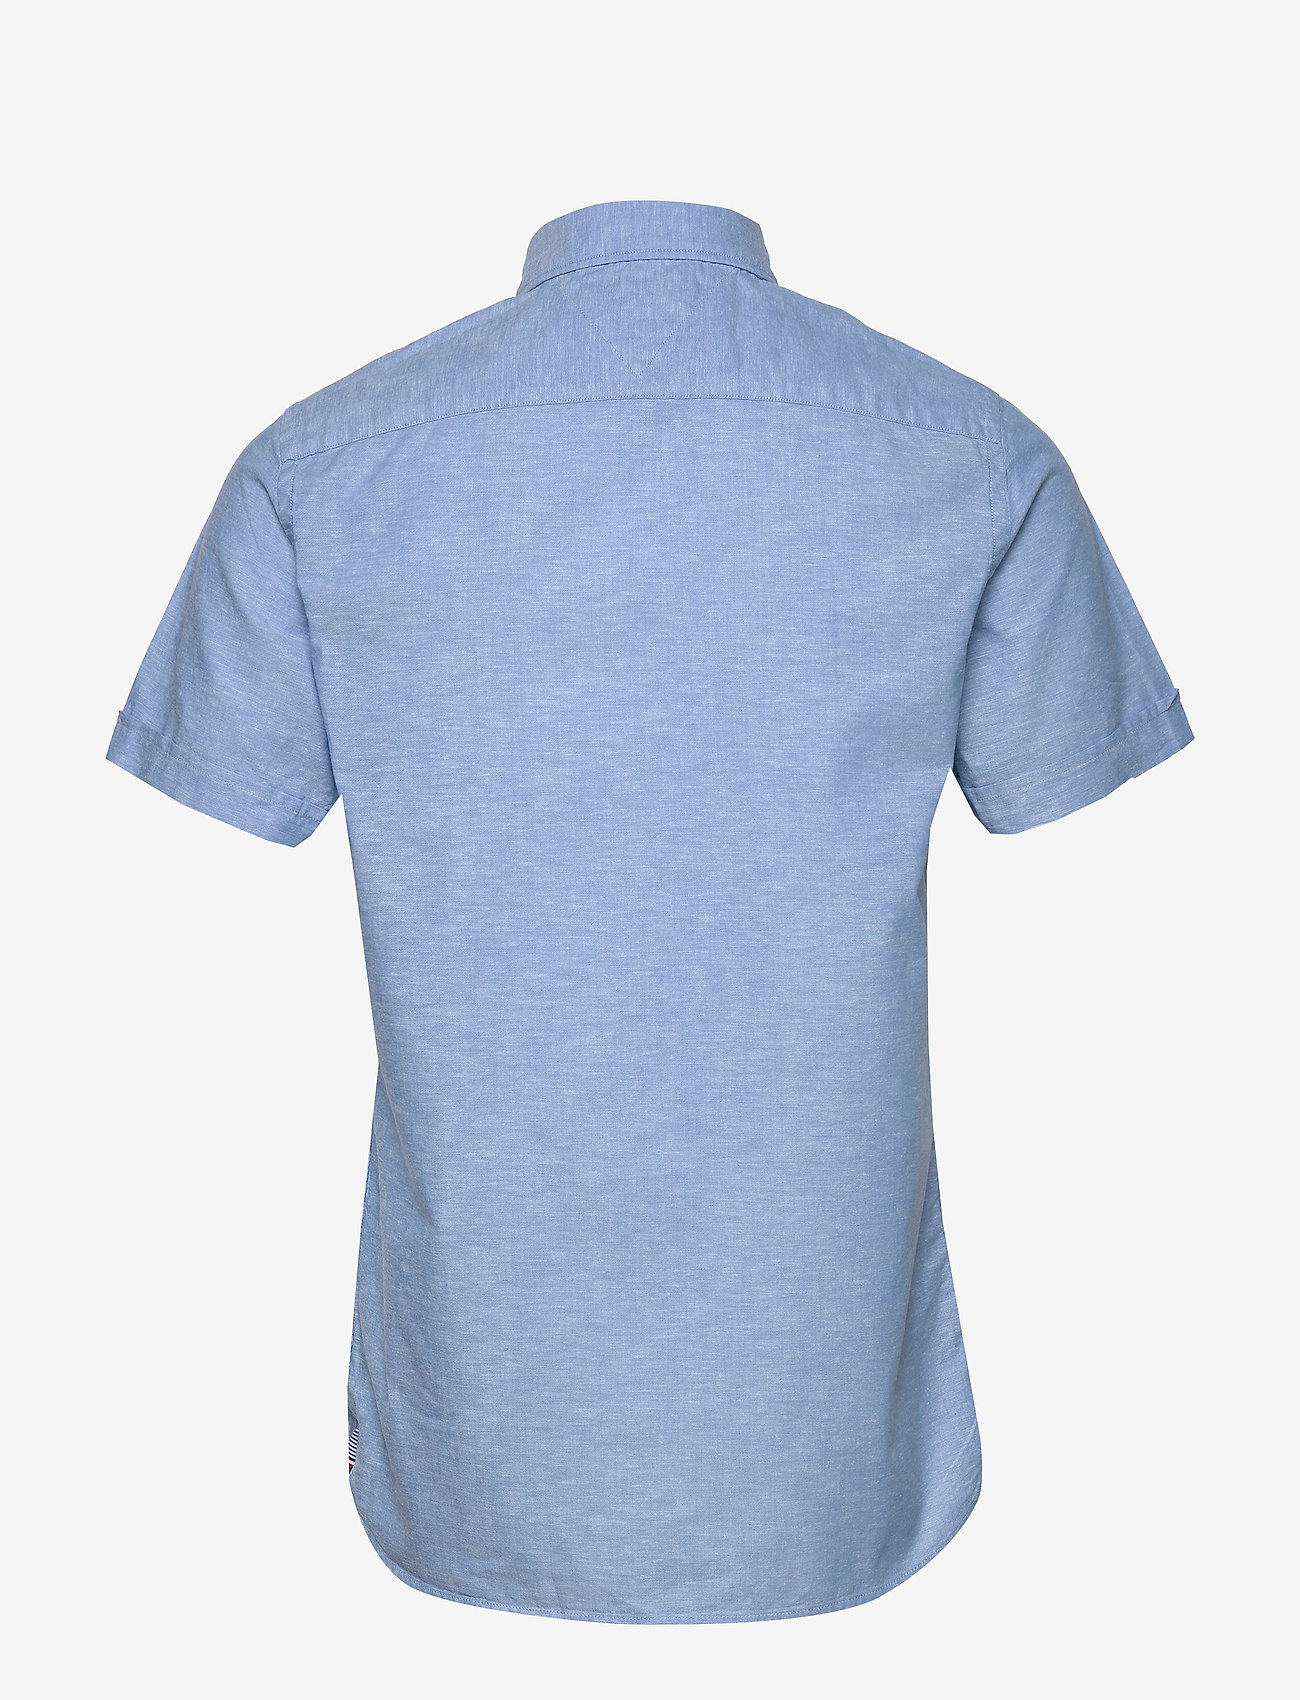 Tommy Hilfiger - SLIM COTTON LINEN SHIRT S/S - short-sleeved shirts - blue ink - 1